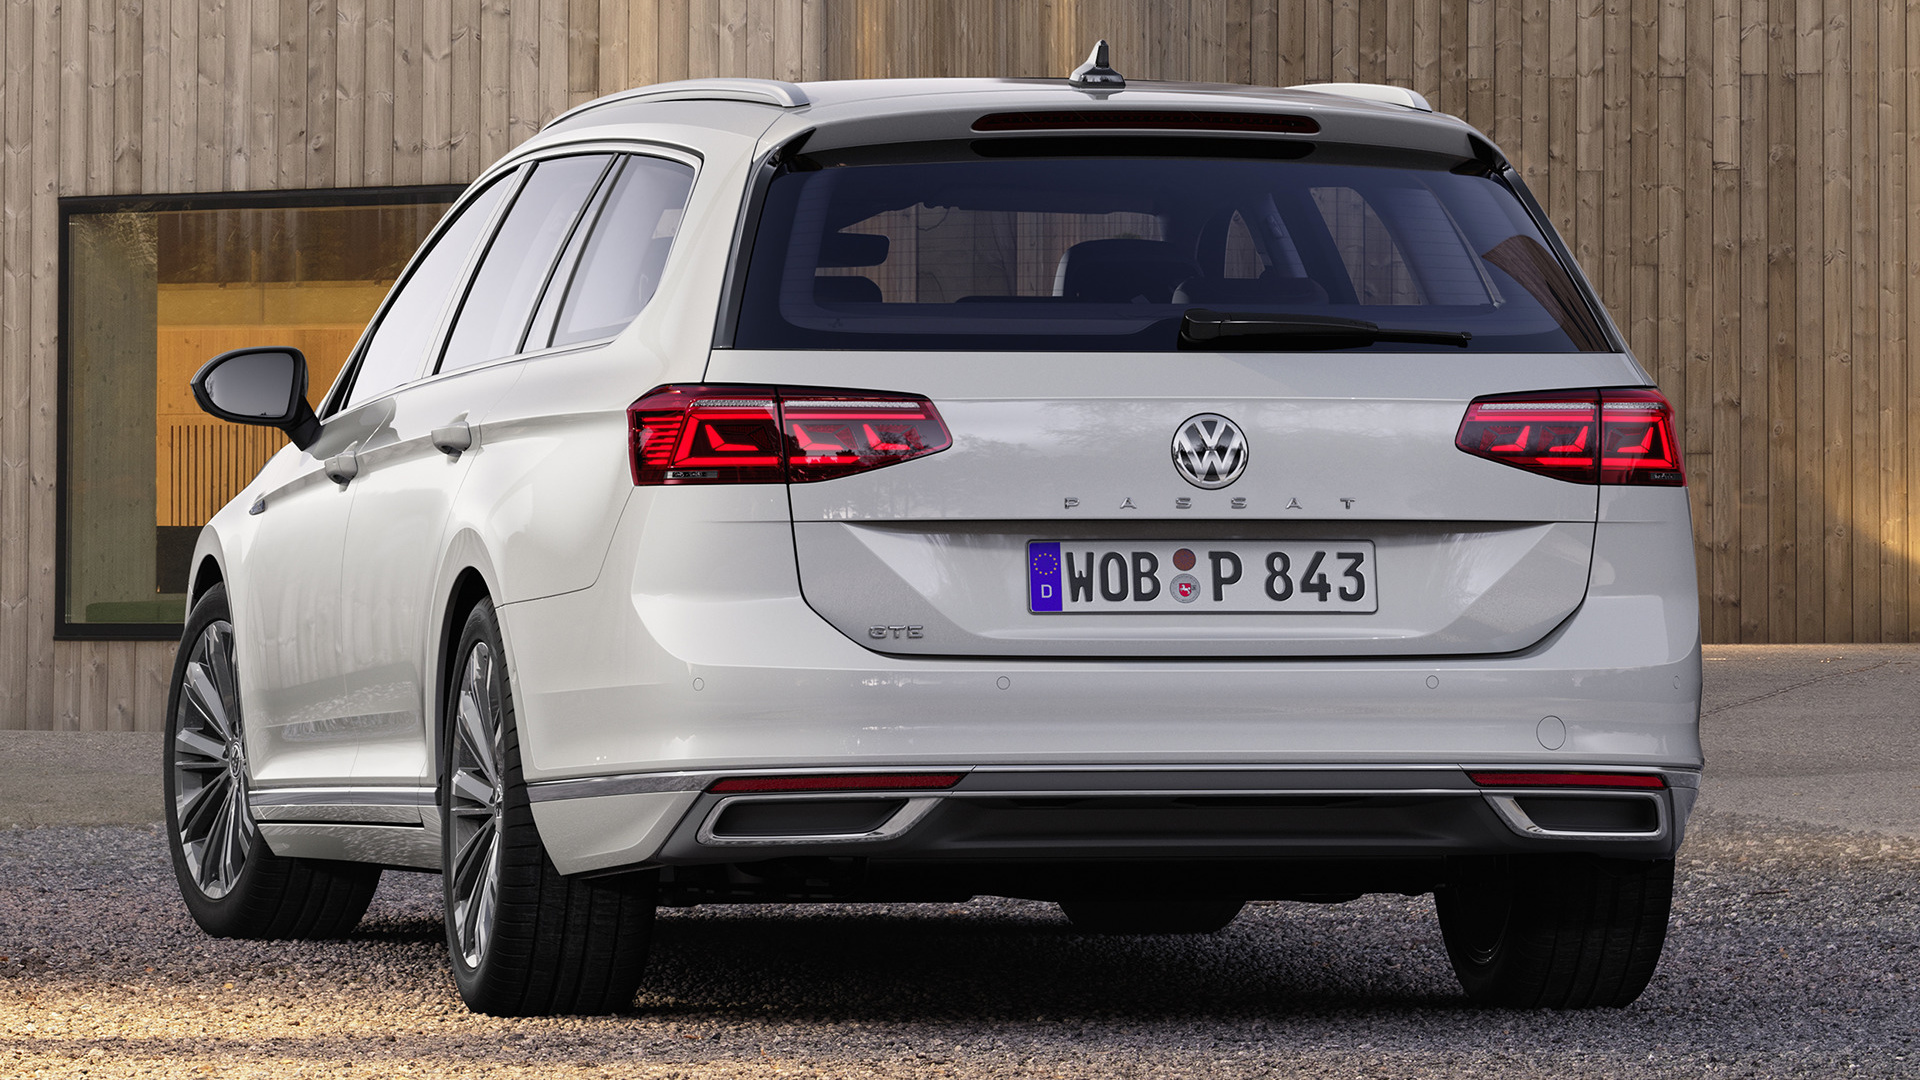 2019 Volkswagen Passat GTE Variant   Wallpapers and HD Images 1920x1080